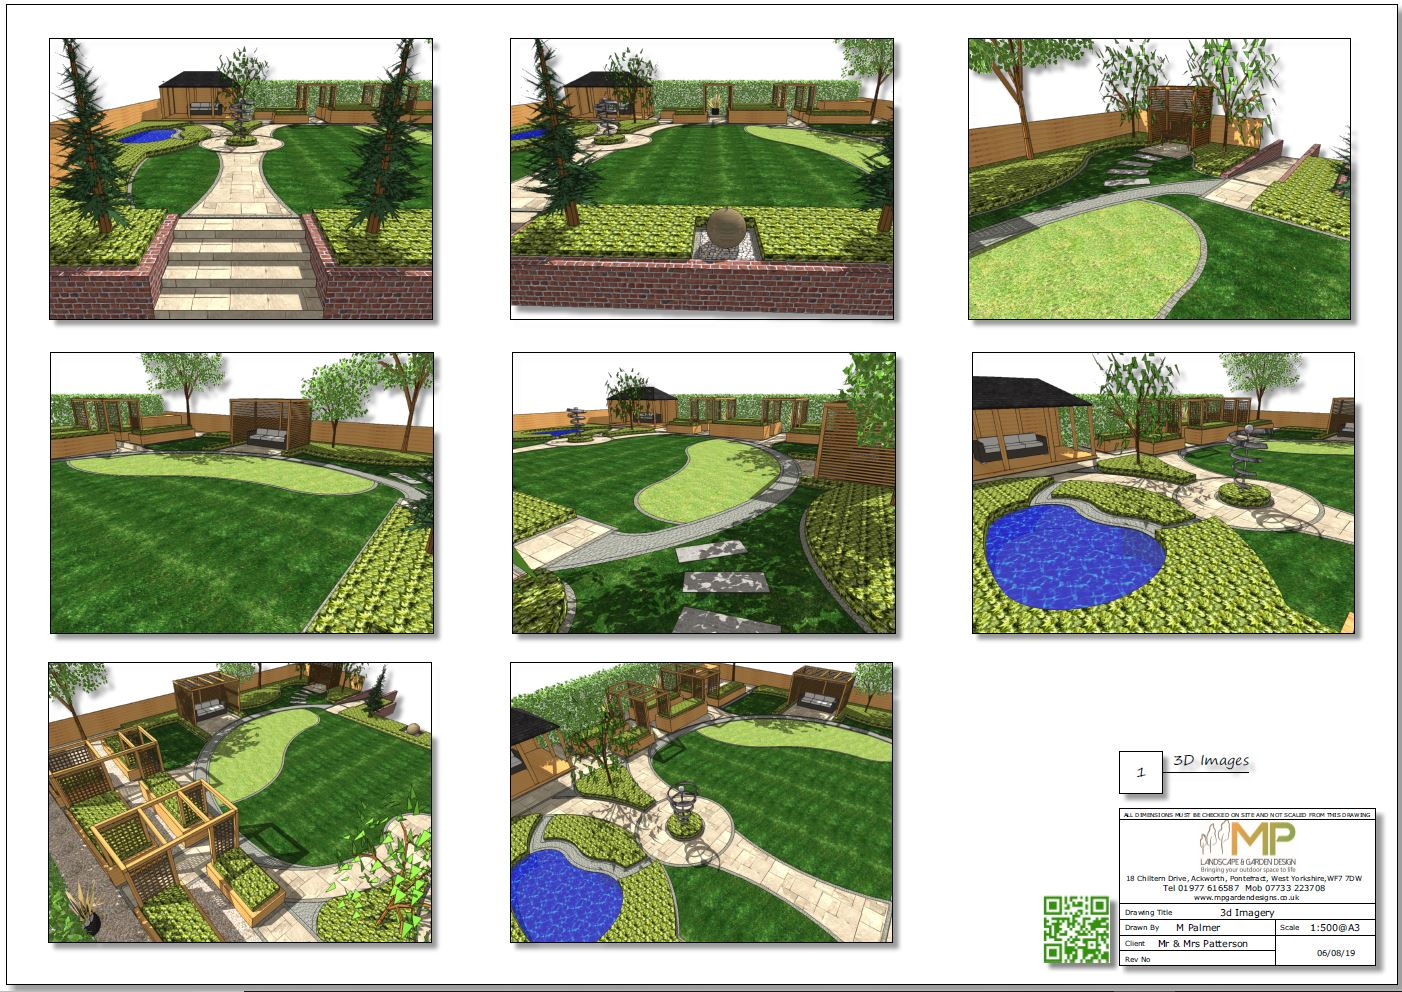 3, Colour 3D imgaes, concept plan 1 for a rear garden in Knottingley